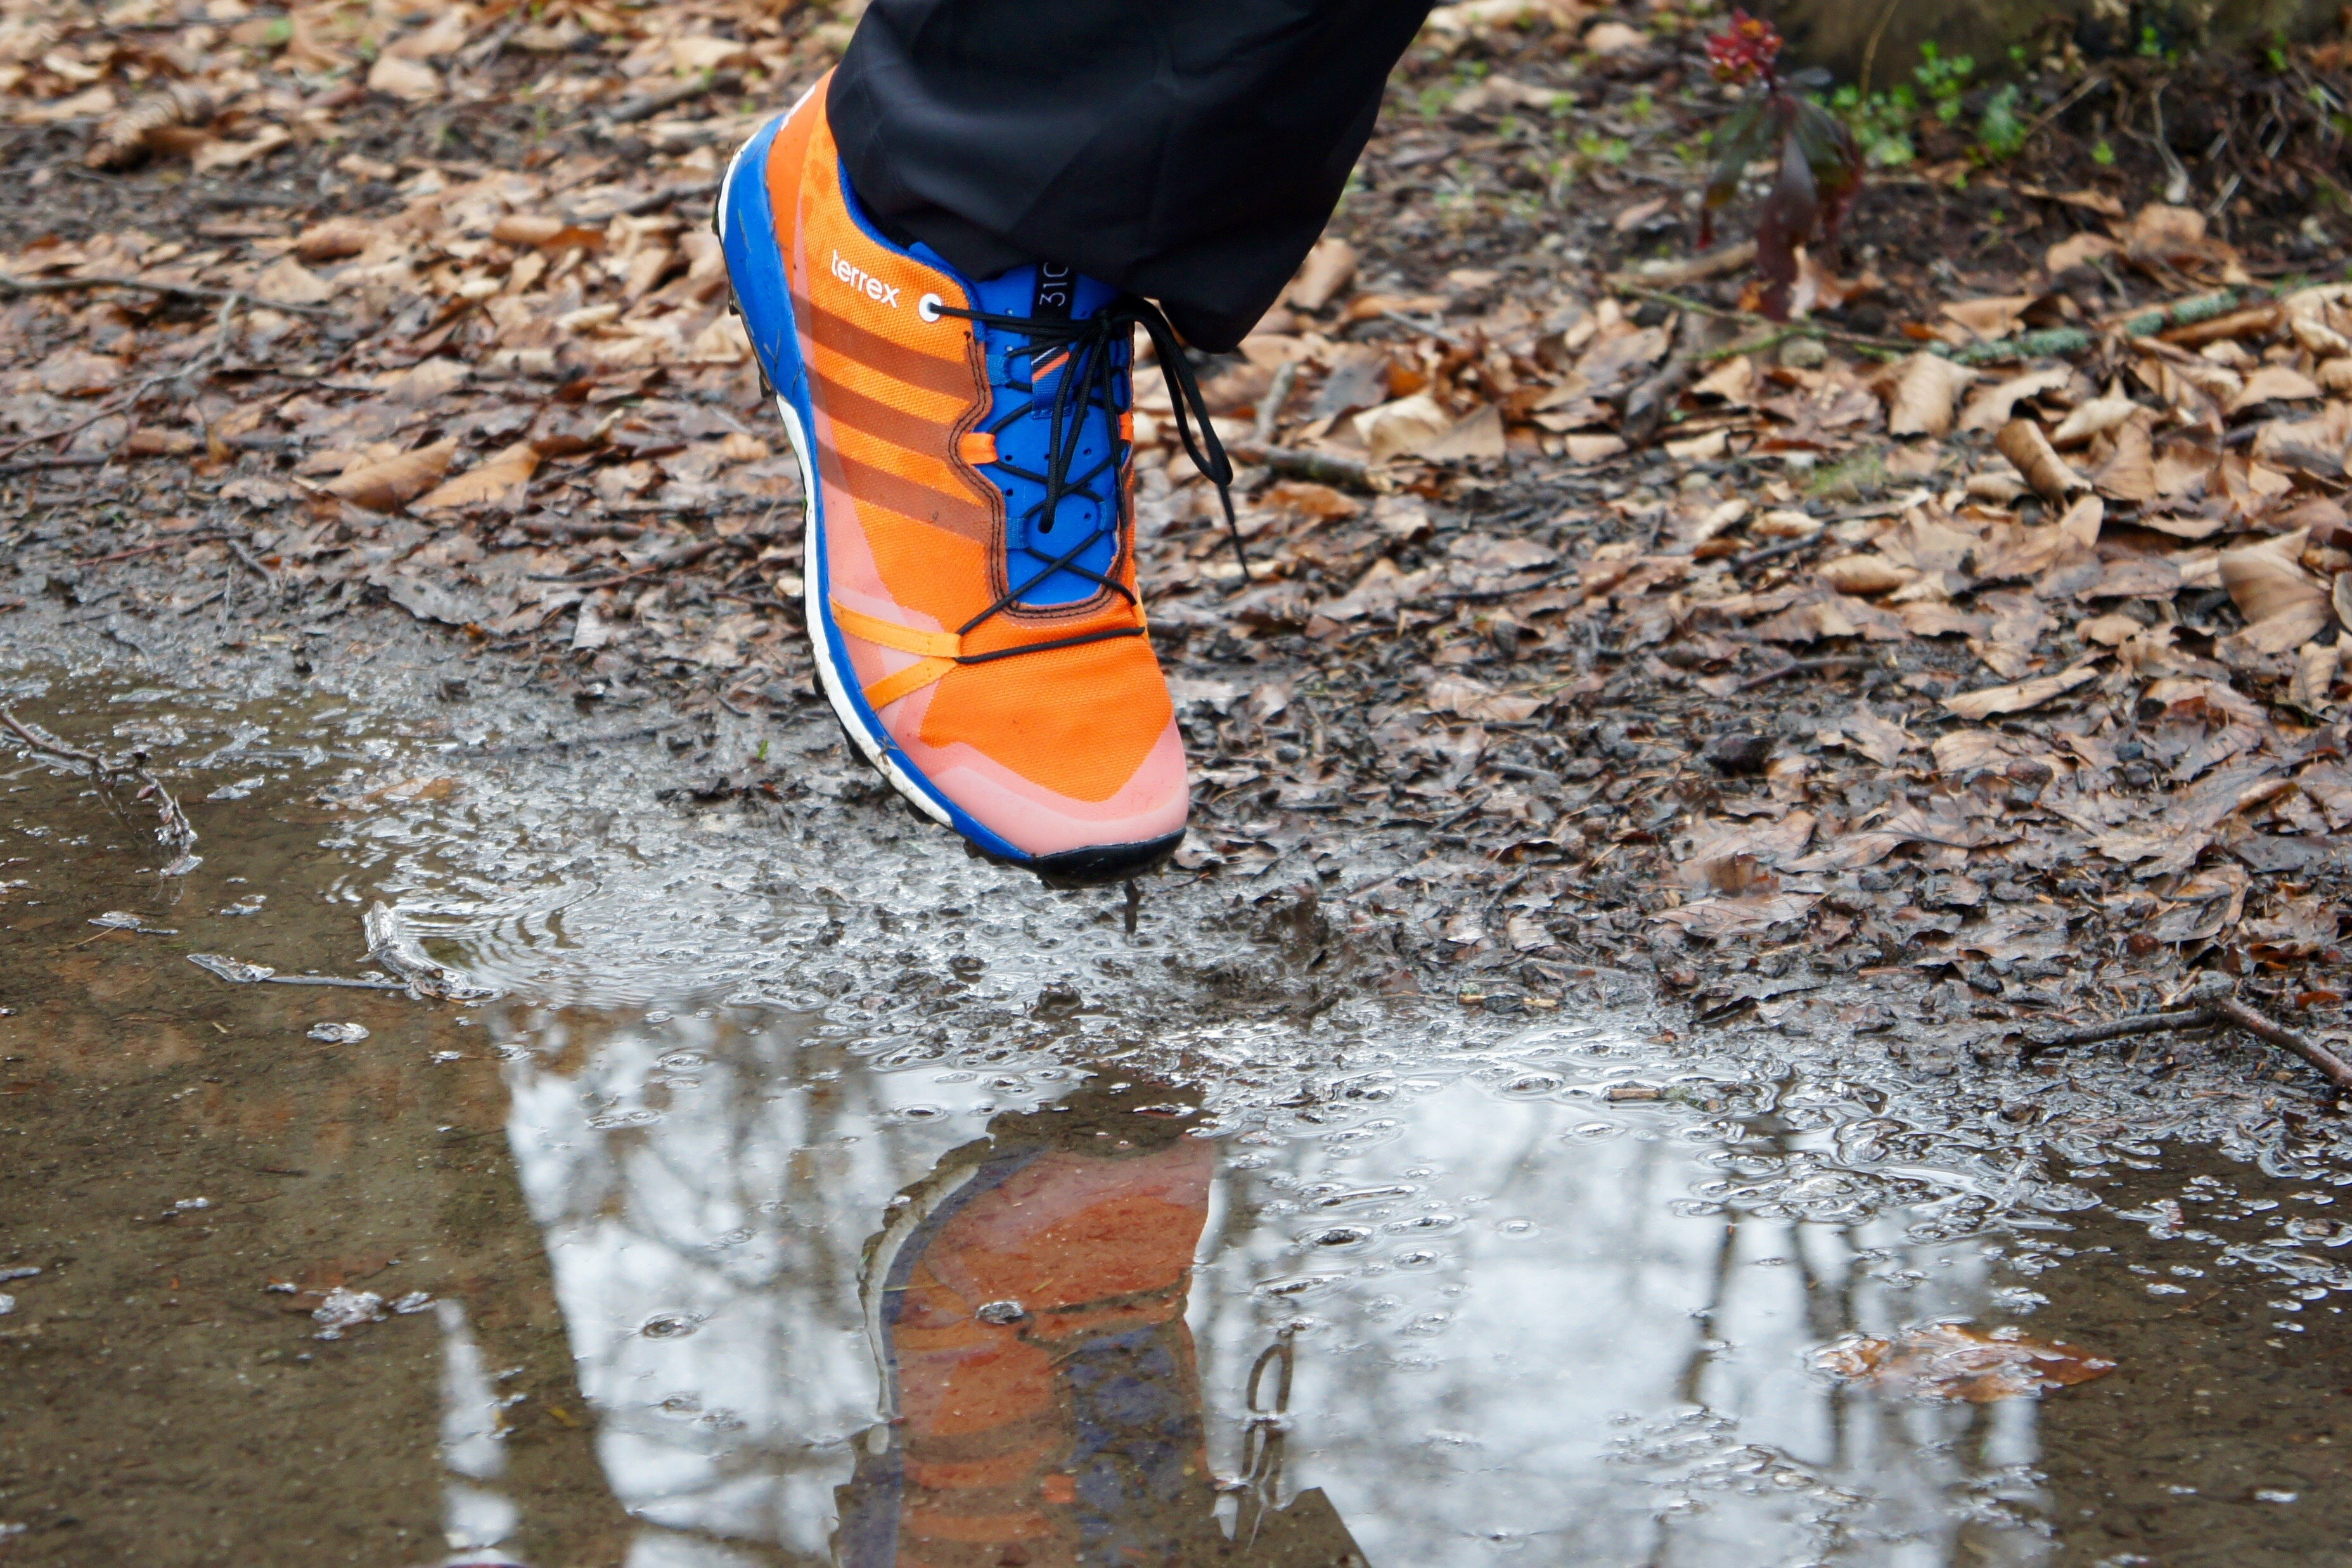 TestAdidas Terrex Terrex Agravic SchuhBergwelten Agravic Trailrunning SchuhBergwelten Trailrunning TestAdidas bgY6vfy7